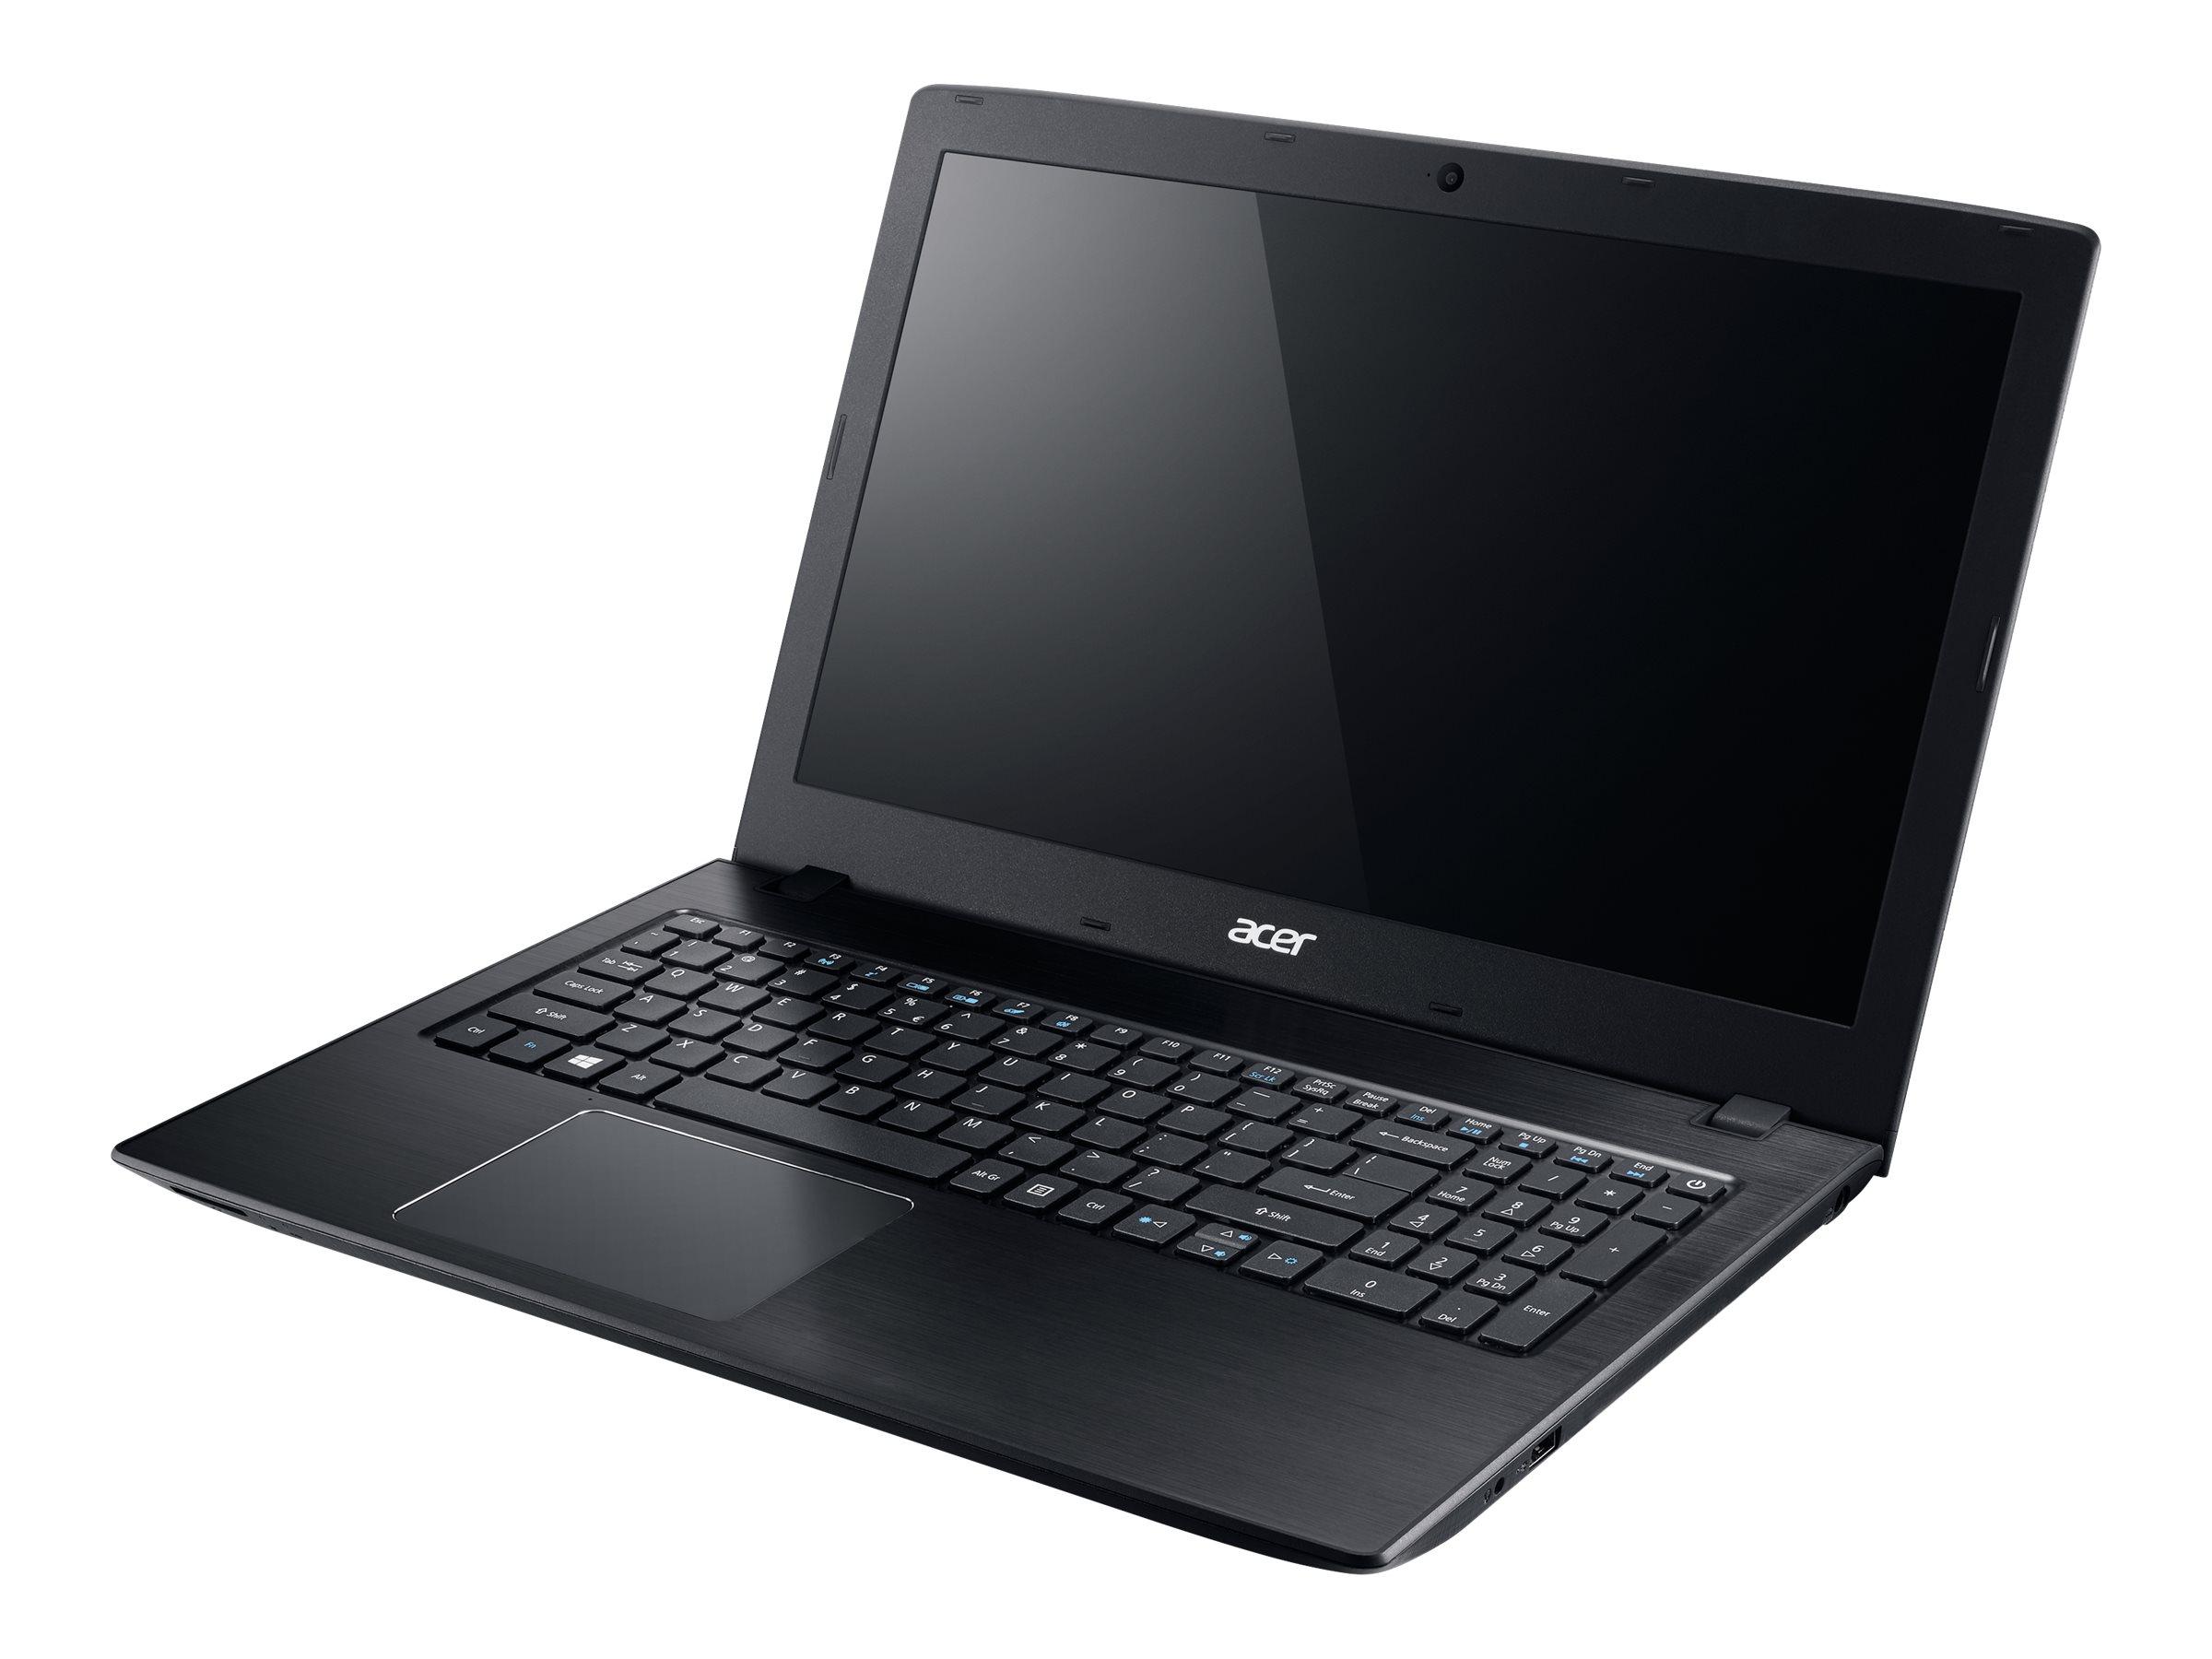 ACER ASPIRE E 15 E5-575G-50AL I5 8GB 1 TB 15.6 W10